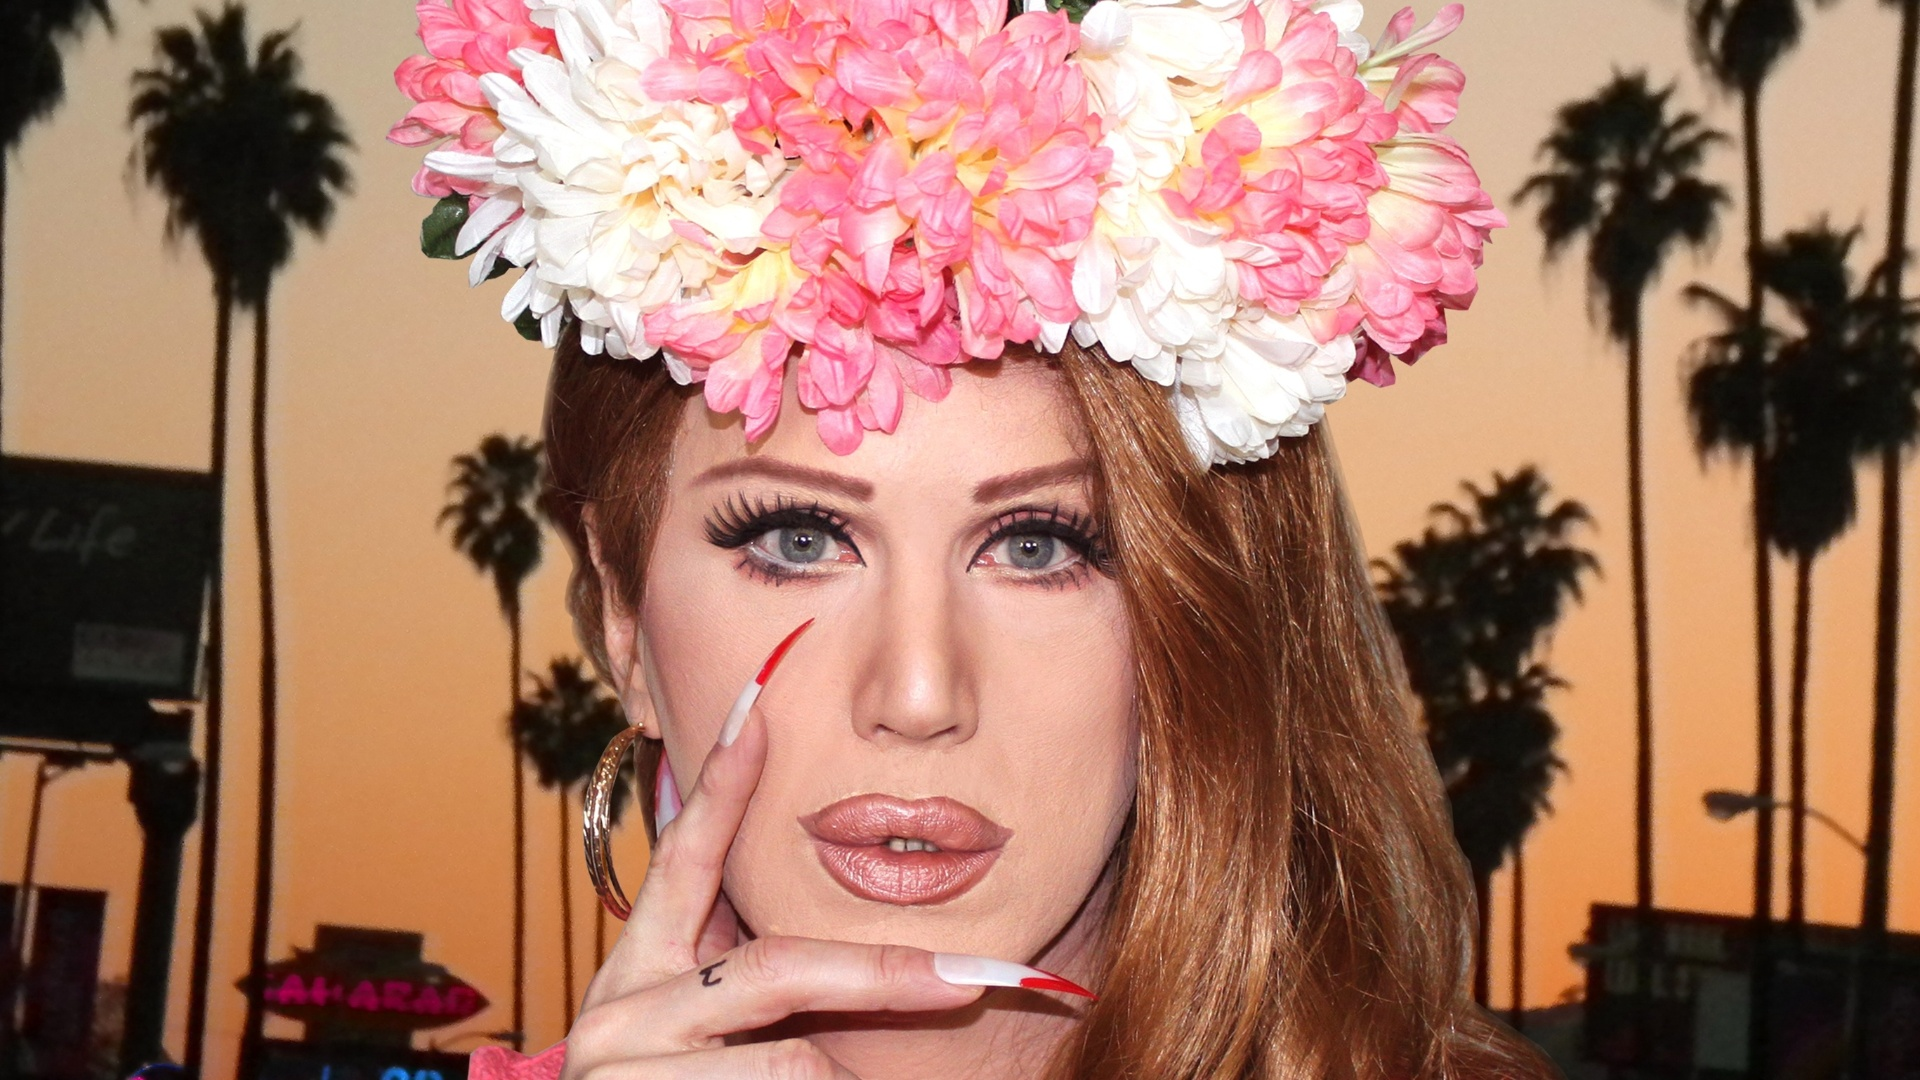 Lana Del Rey Yearbook Charlie grant lana del reyLana Del Rey Yearbook